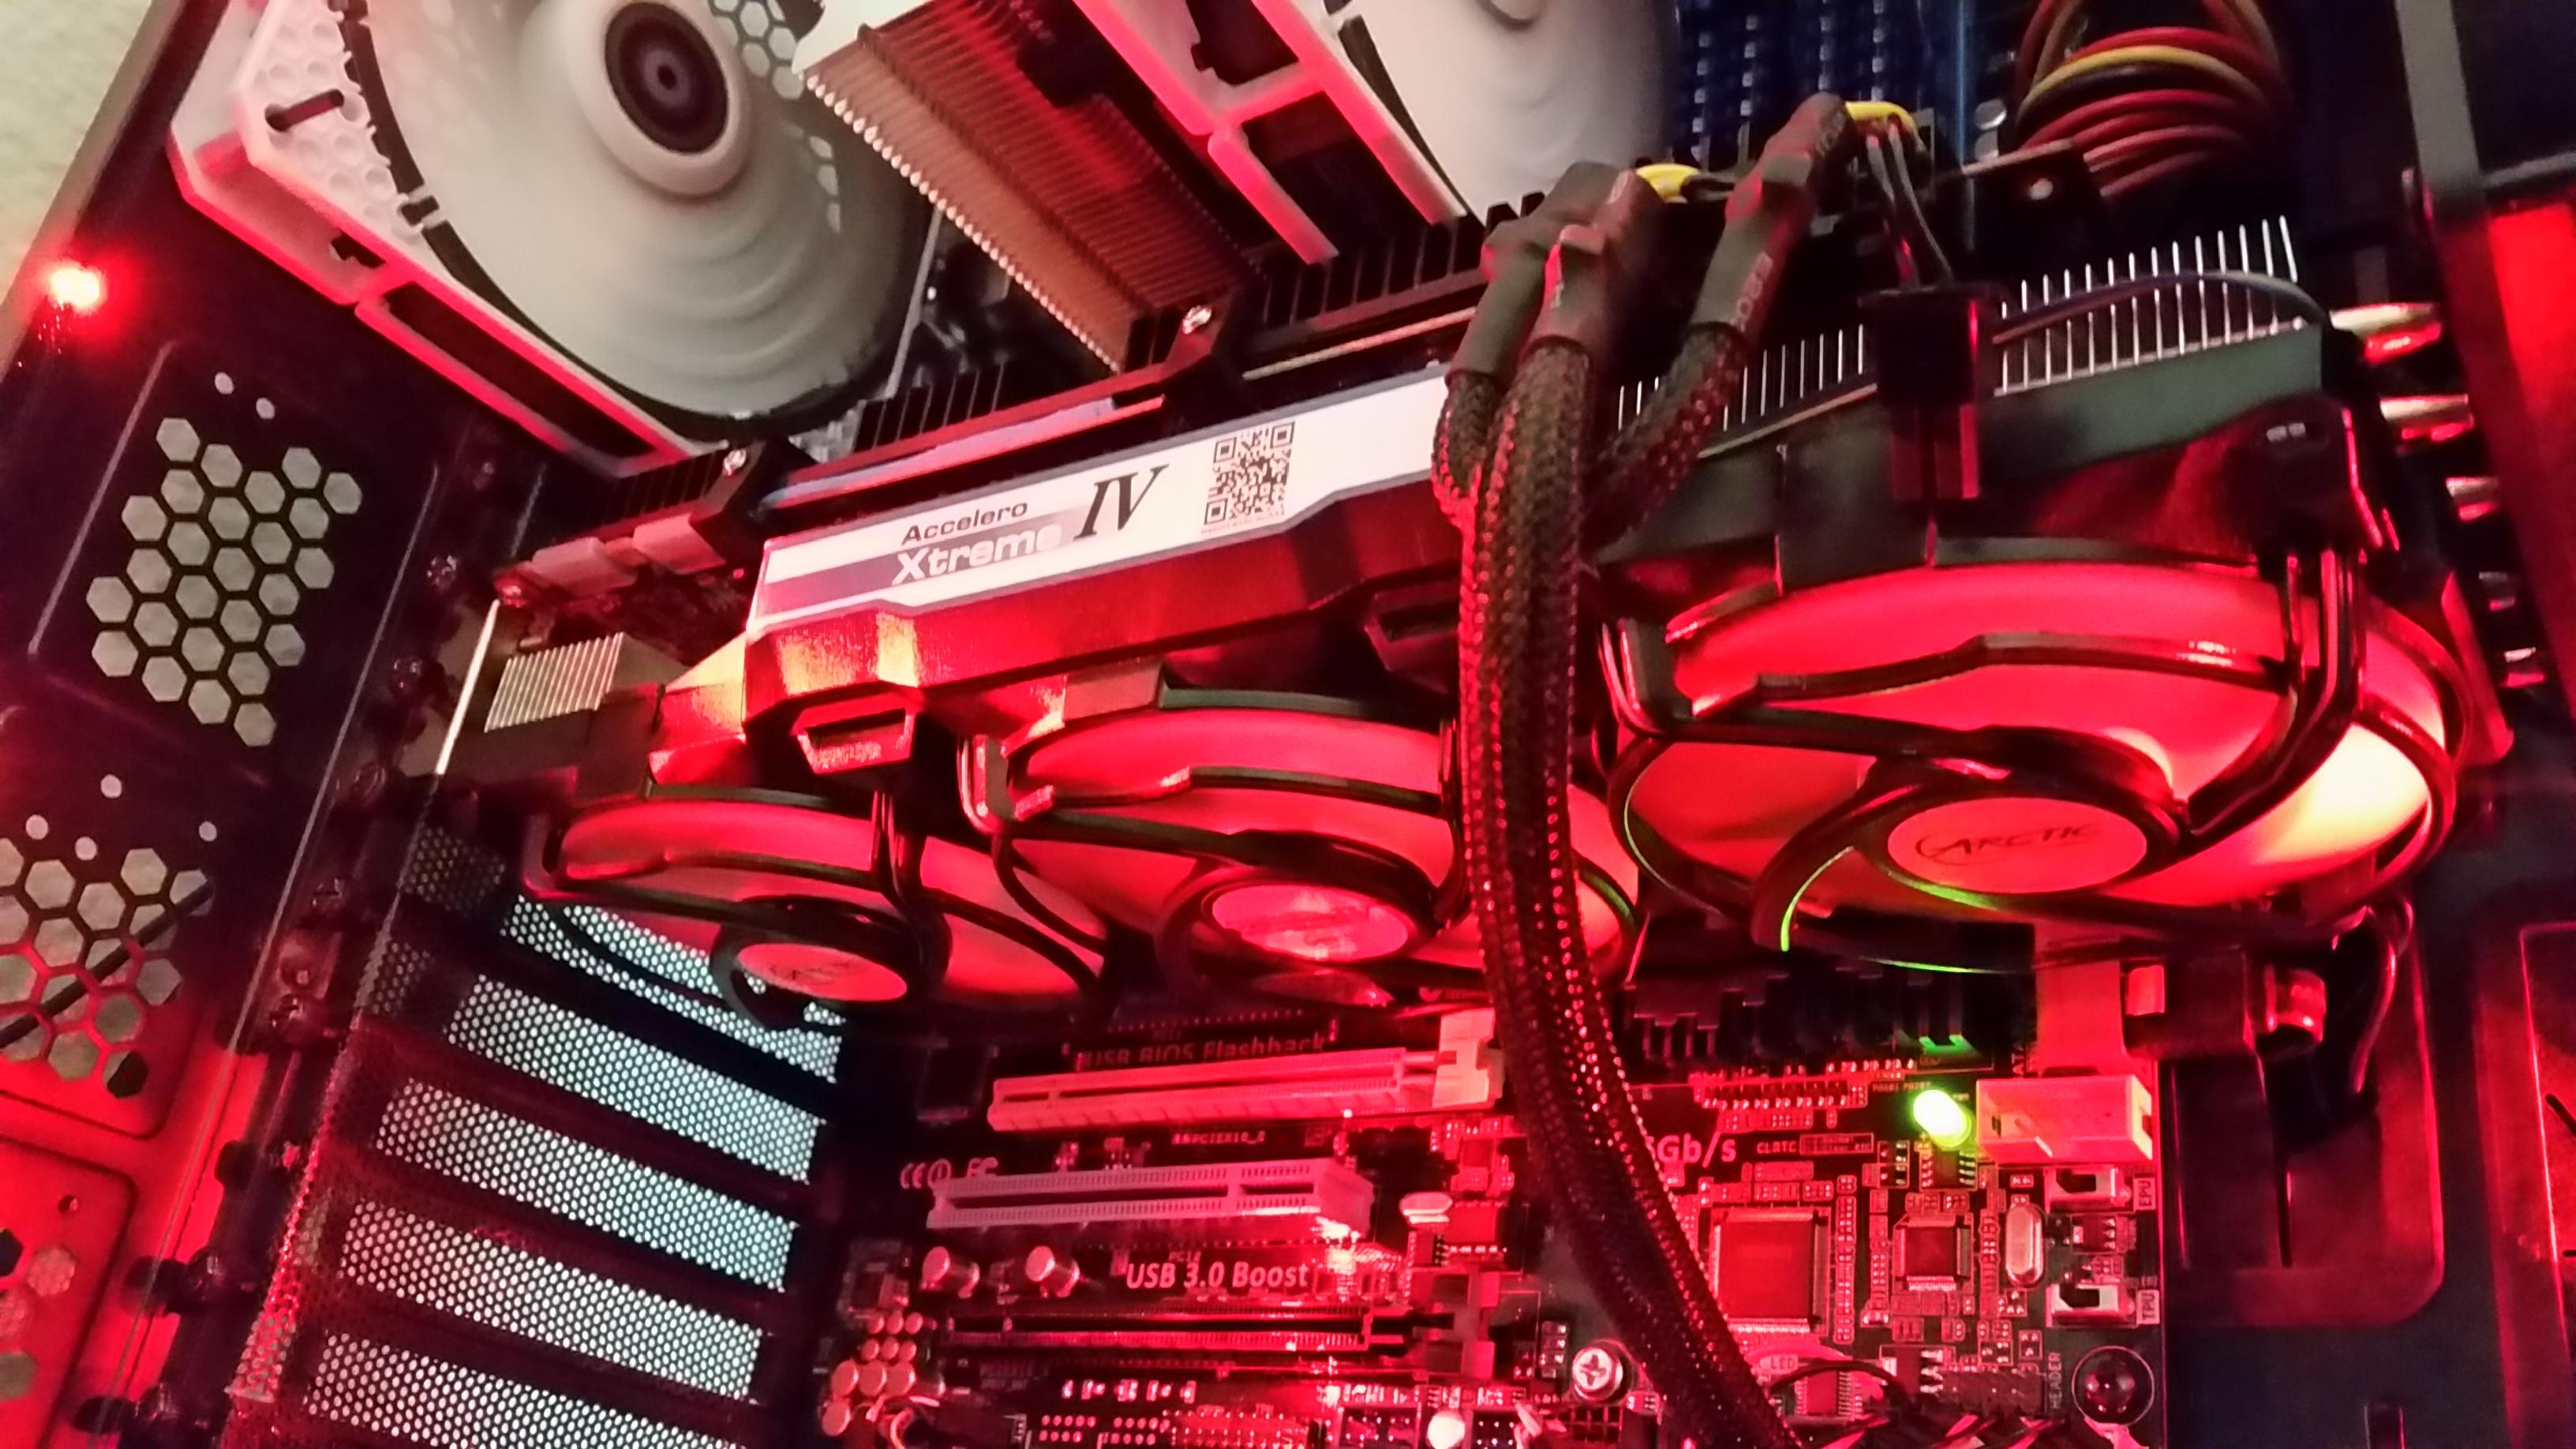 GPU Cooler.jpg